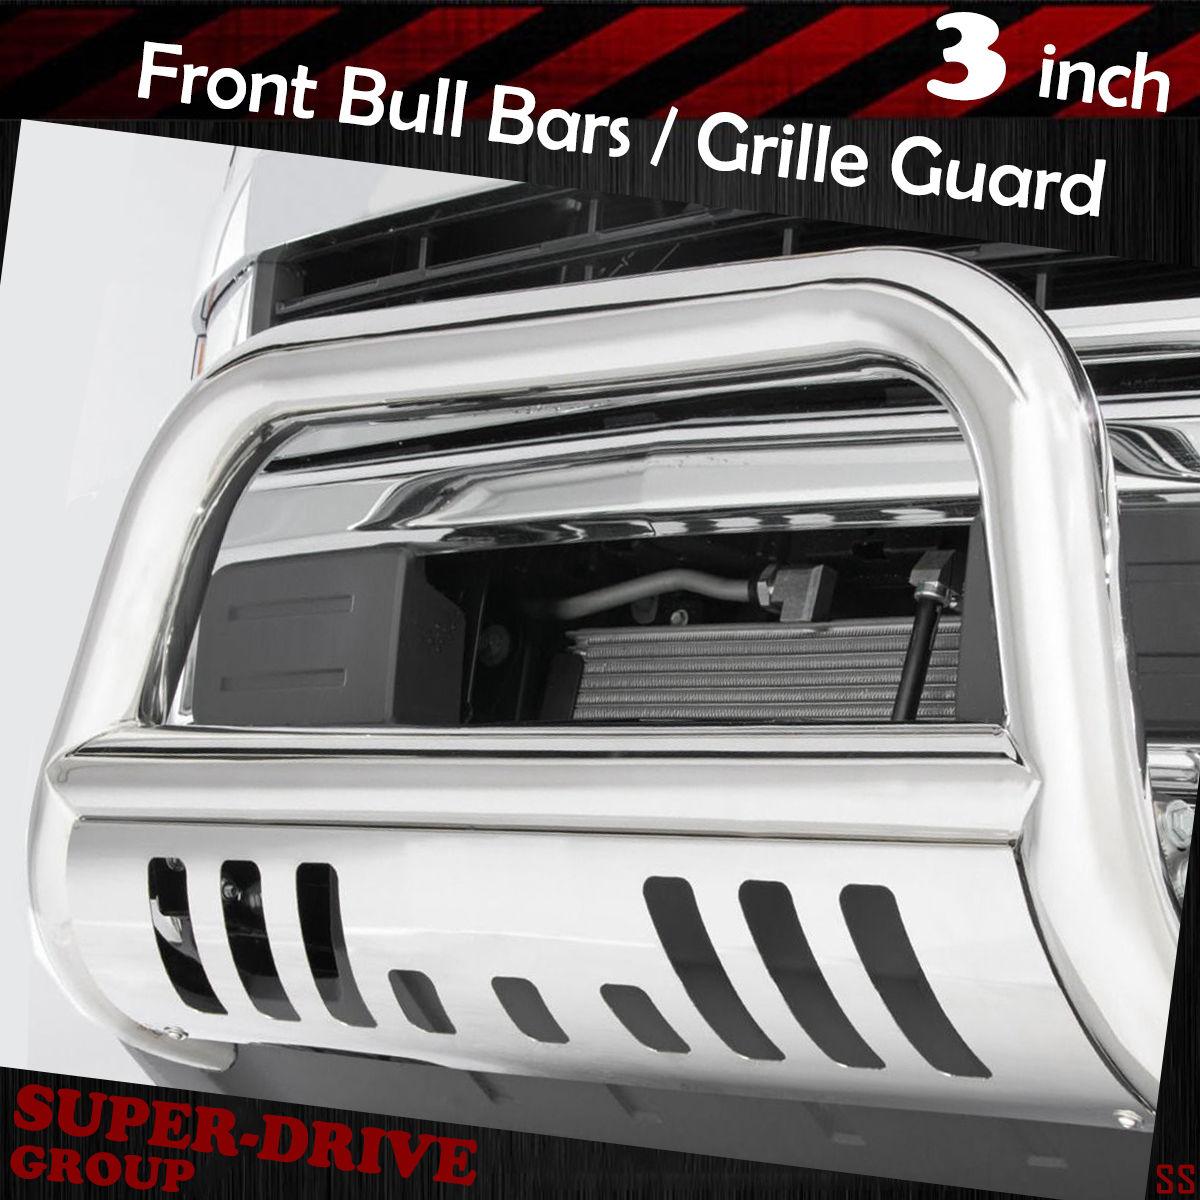 2007-2010 Chevy Silverado 2500 Bull Bar Brush Guard Nudge Stainless Steel Chrome